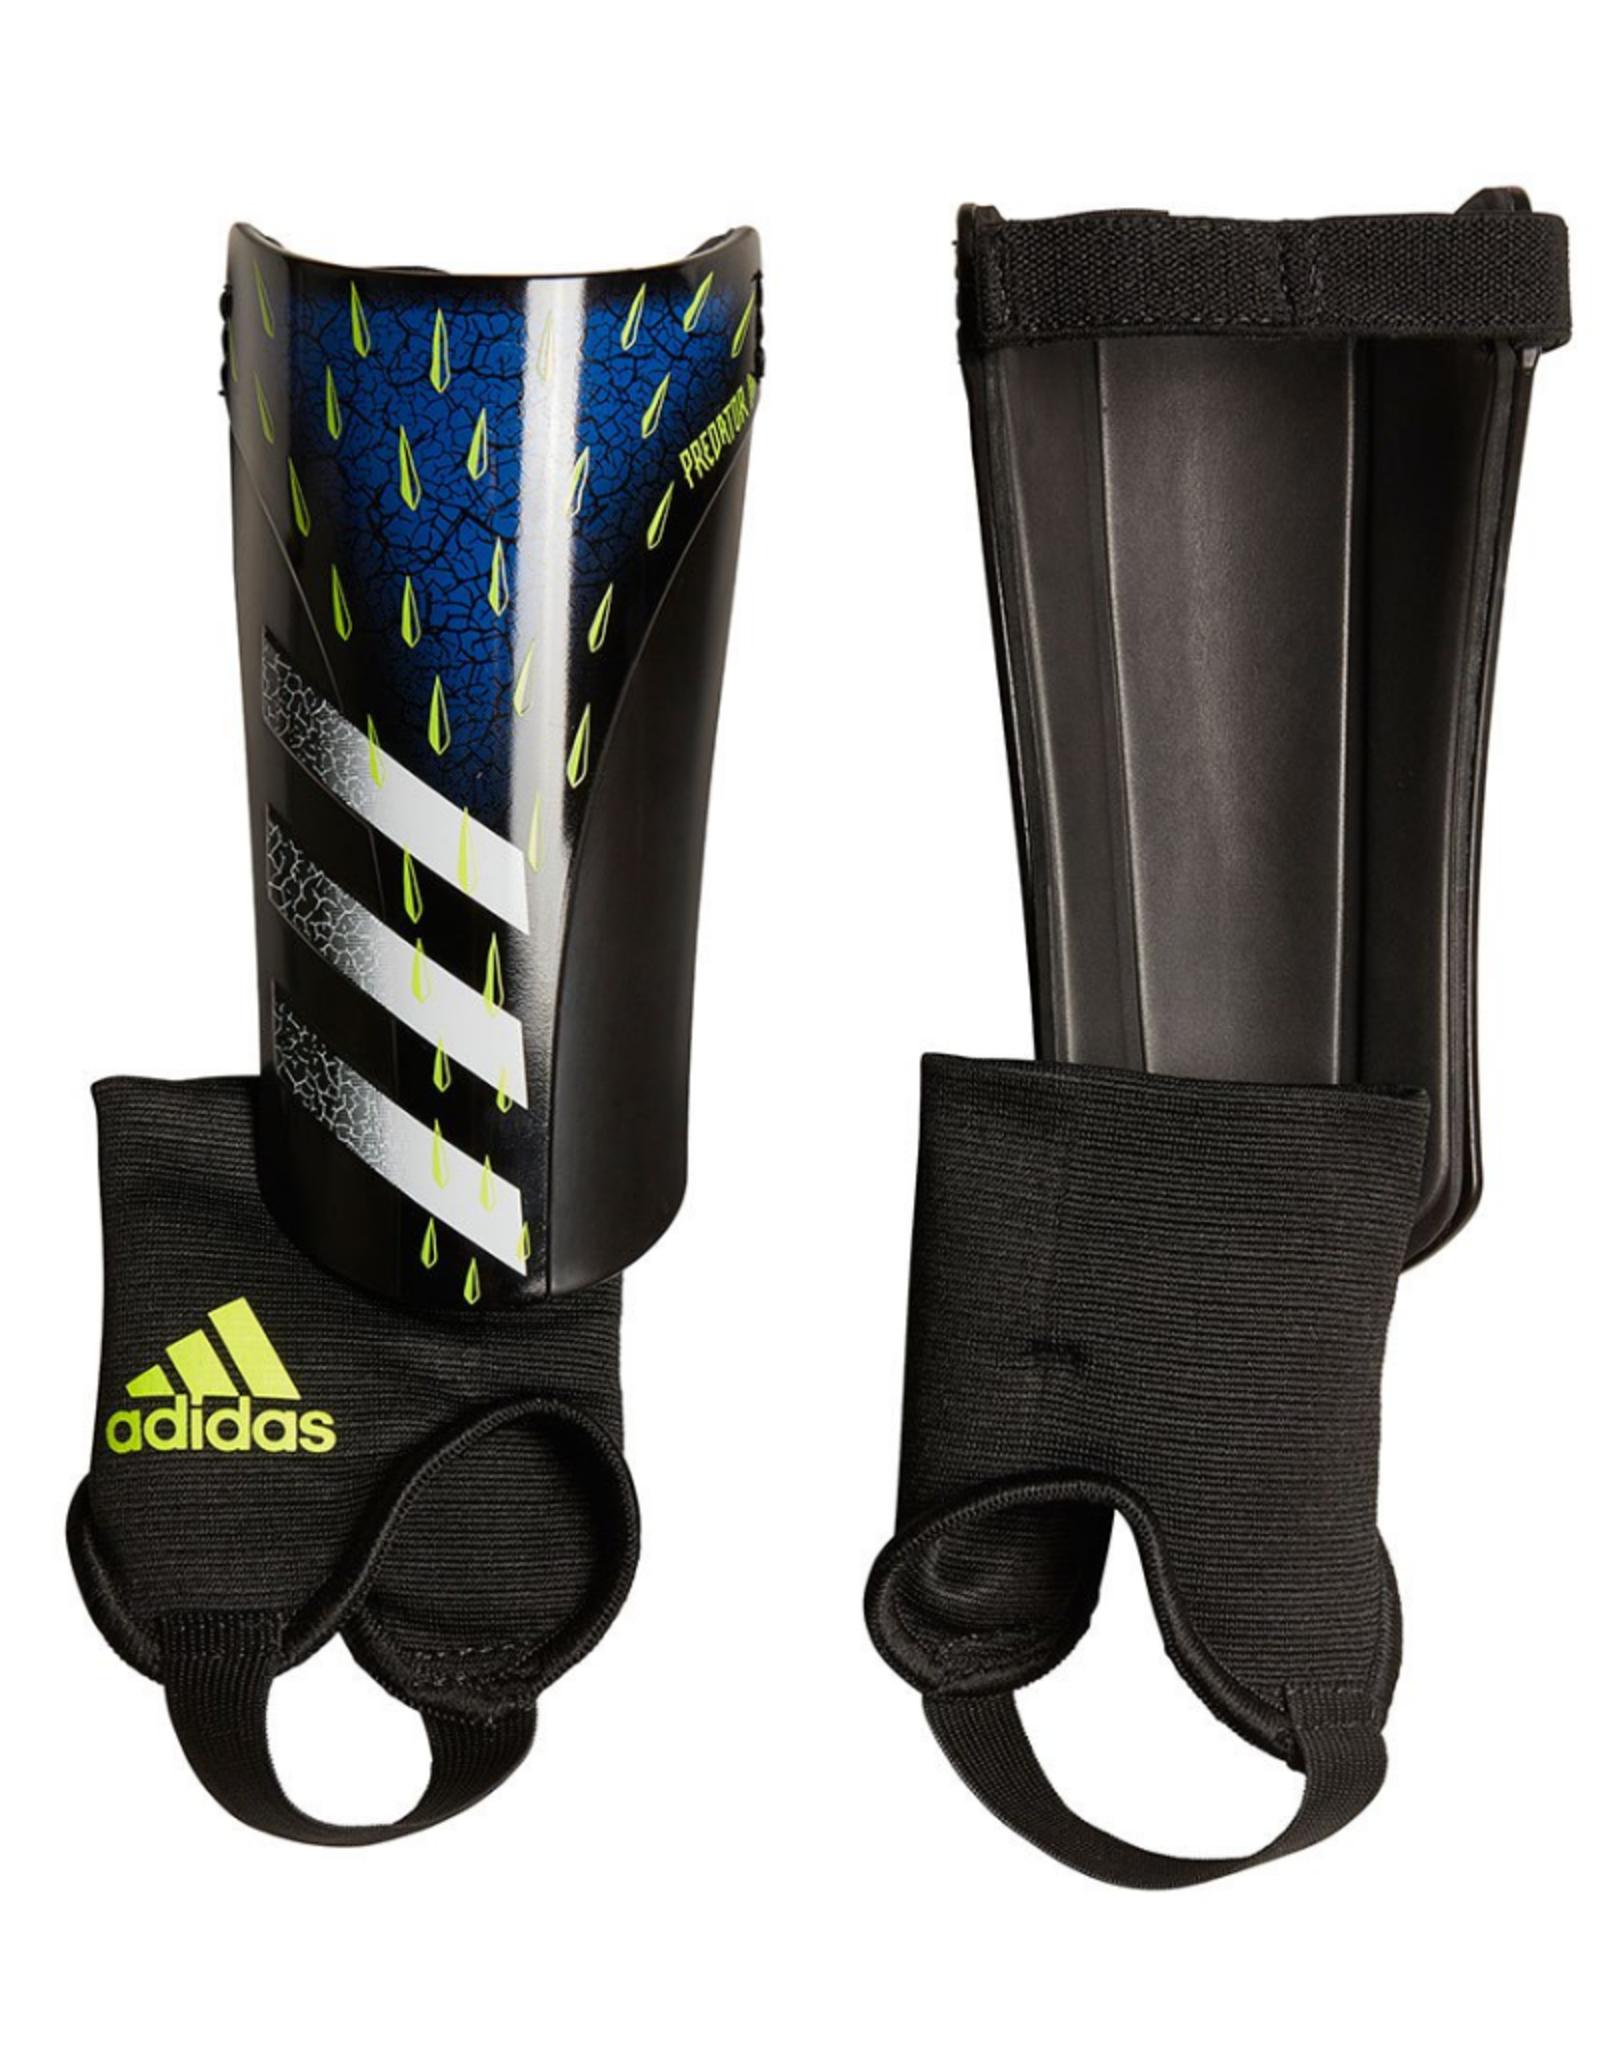 Adidas Adidas Predator Match Shin Guard